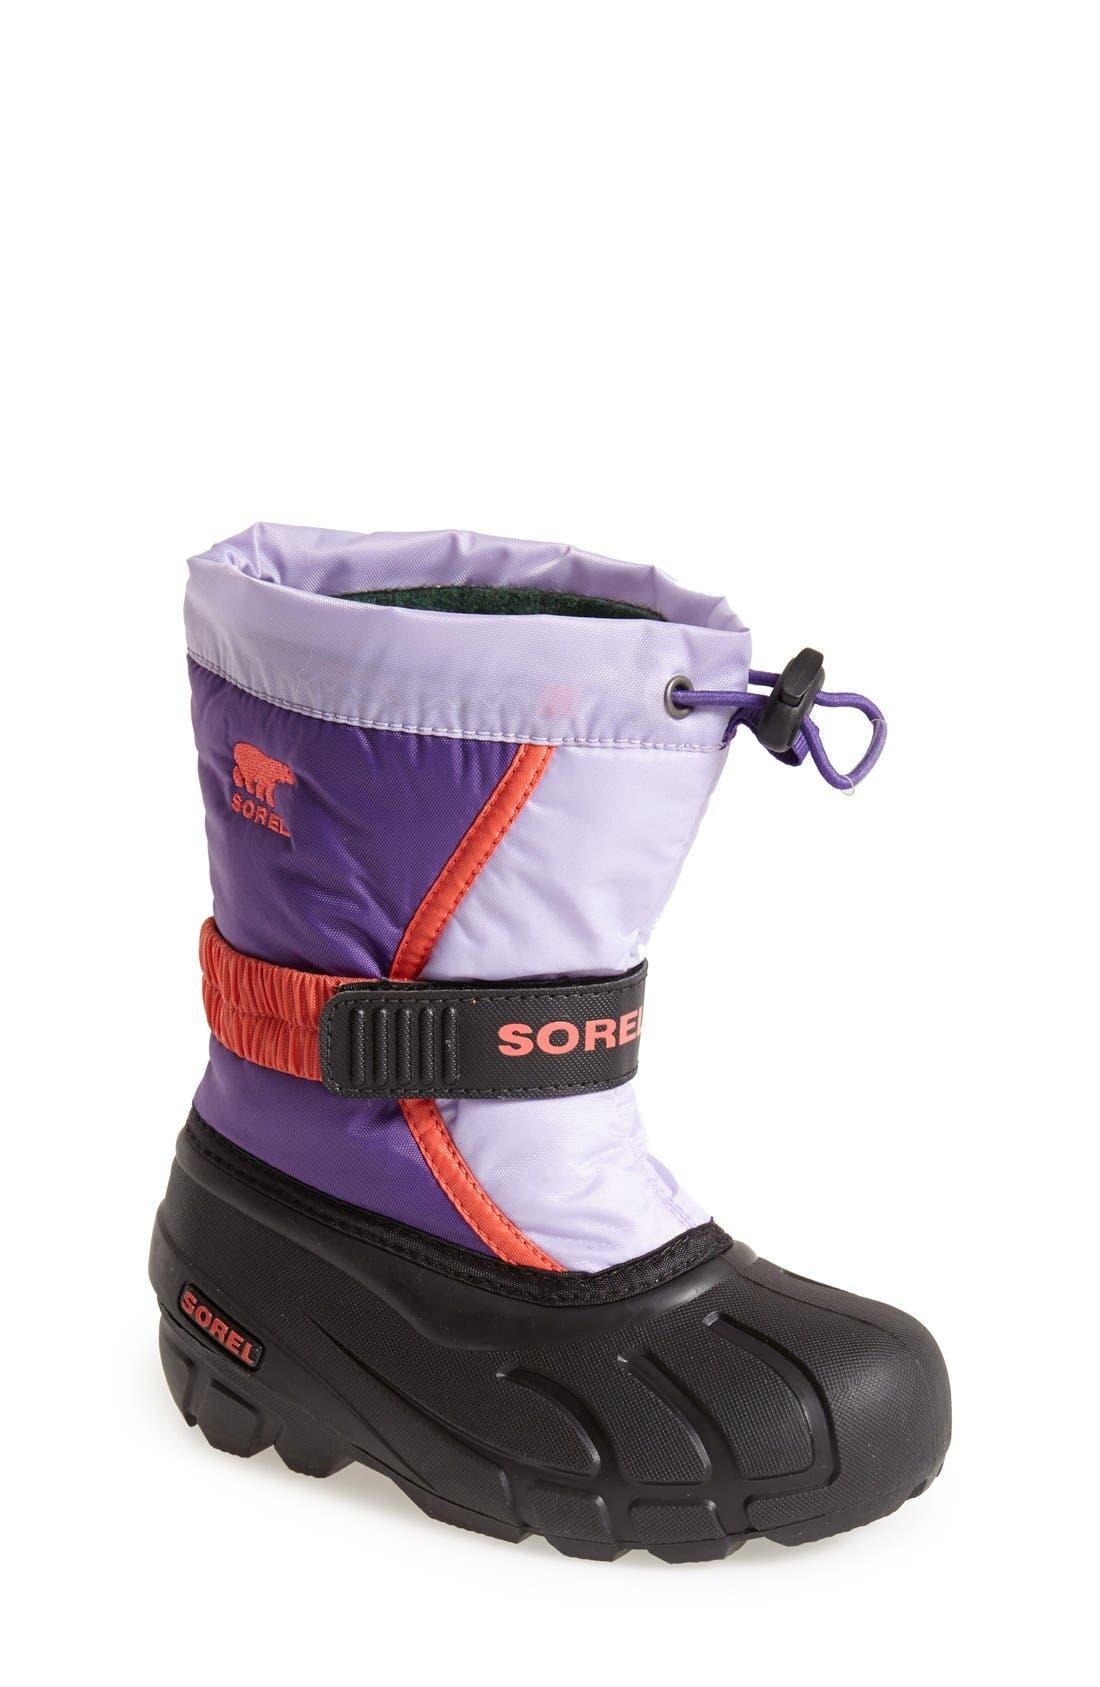 Main Image - Sorel 'Flurry' Boot (Toddler, Little Kid & Big Kid)